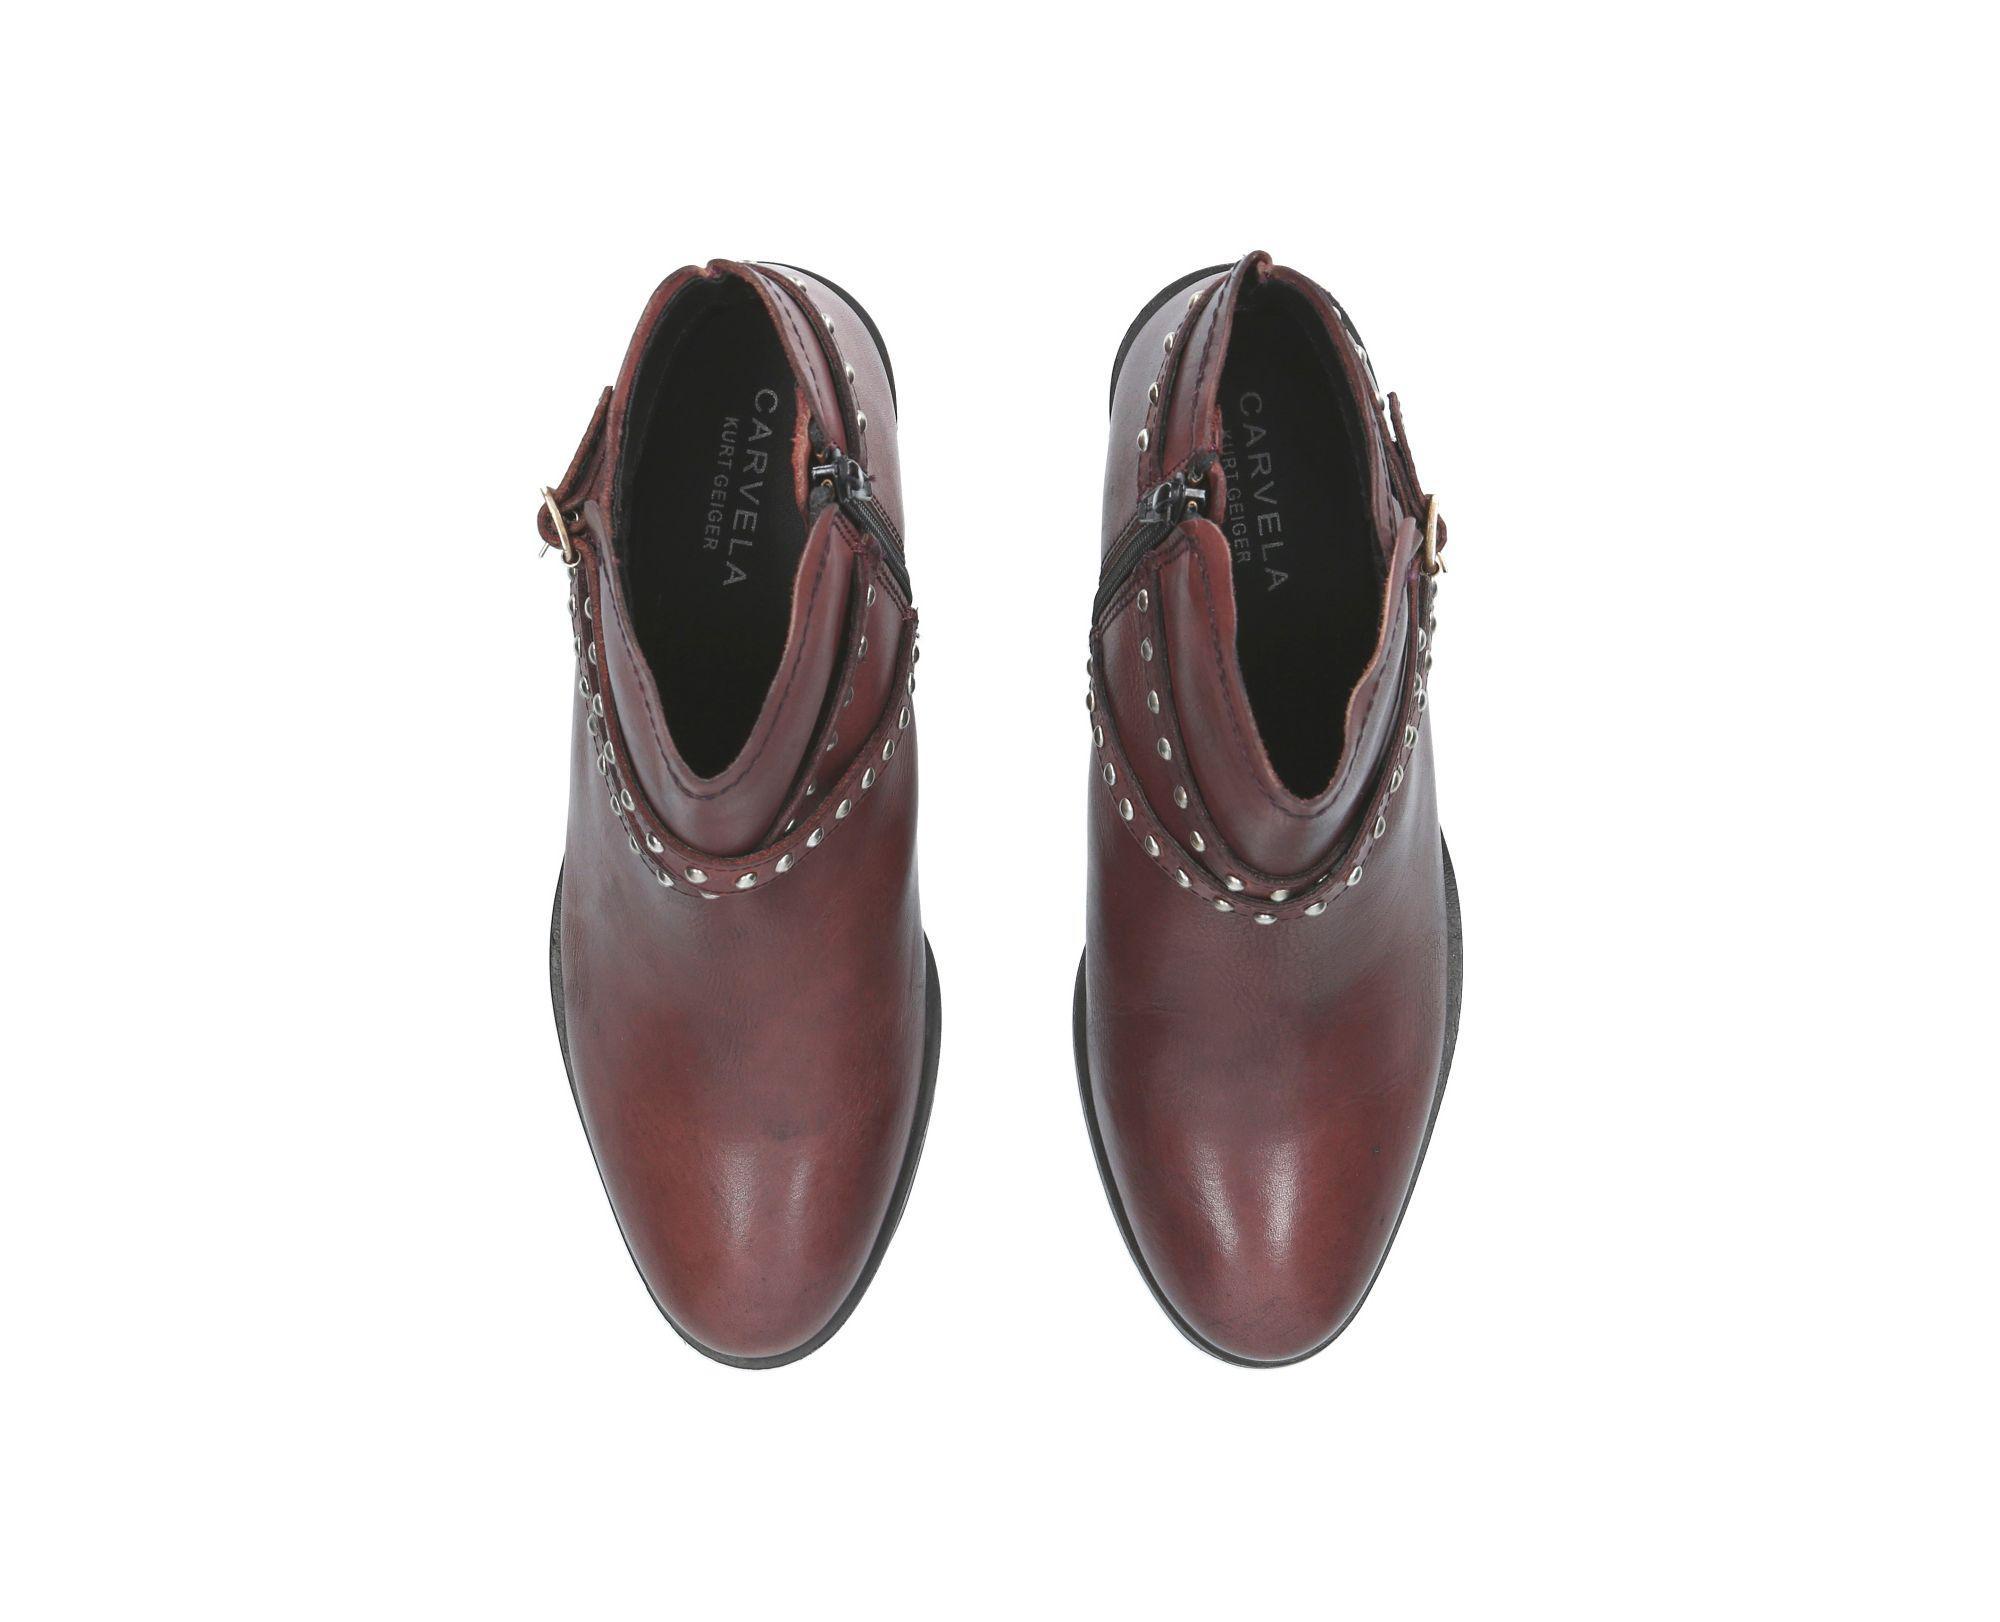 Carvela Kurt Geiger 'steel' Flat Ankle Boots in Red